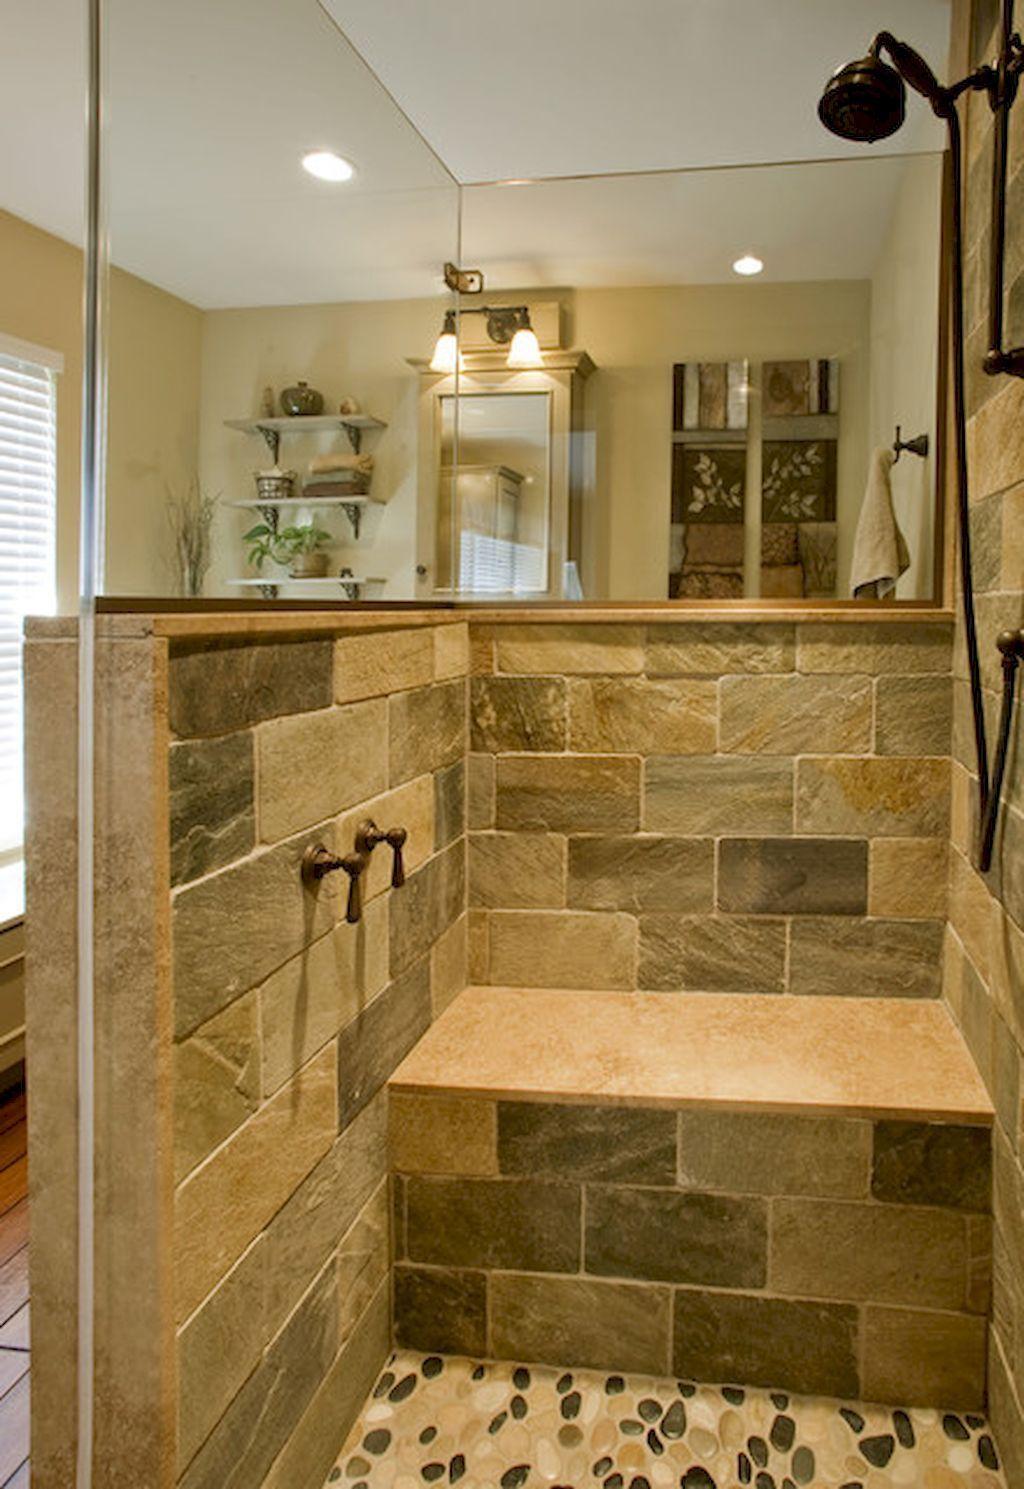 120 Modern Farmhouse Bathroom Design Ideas And Remodel (8 ... on Rustic Farmhouse Bathroom Tile  id=73388